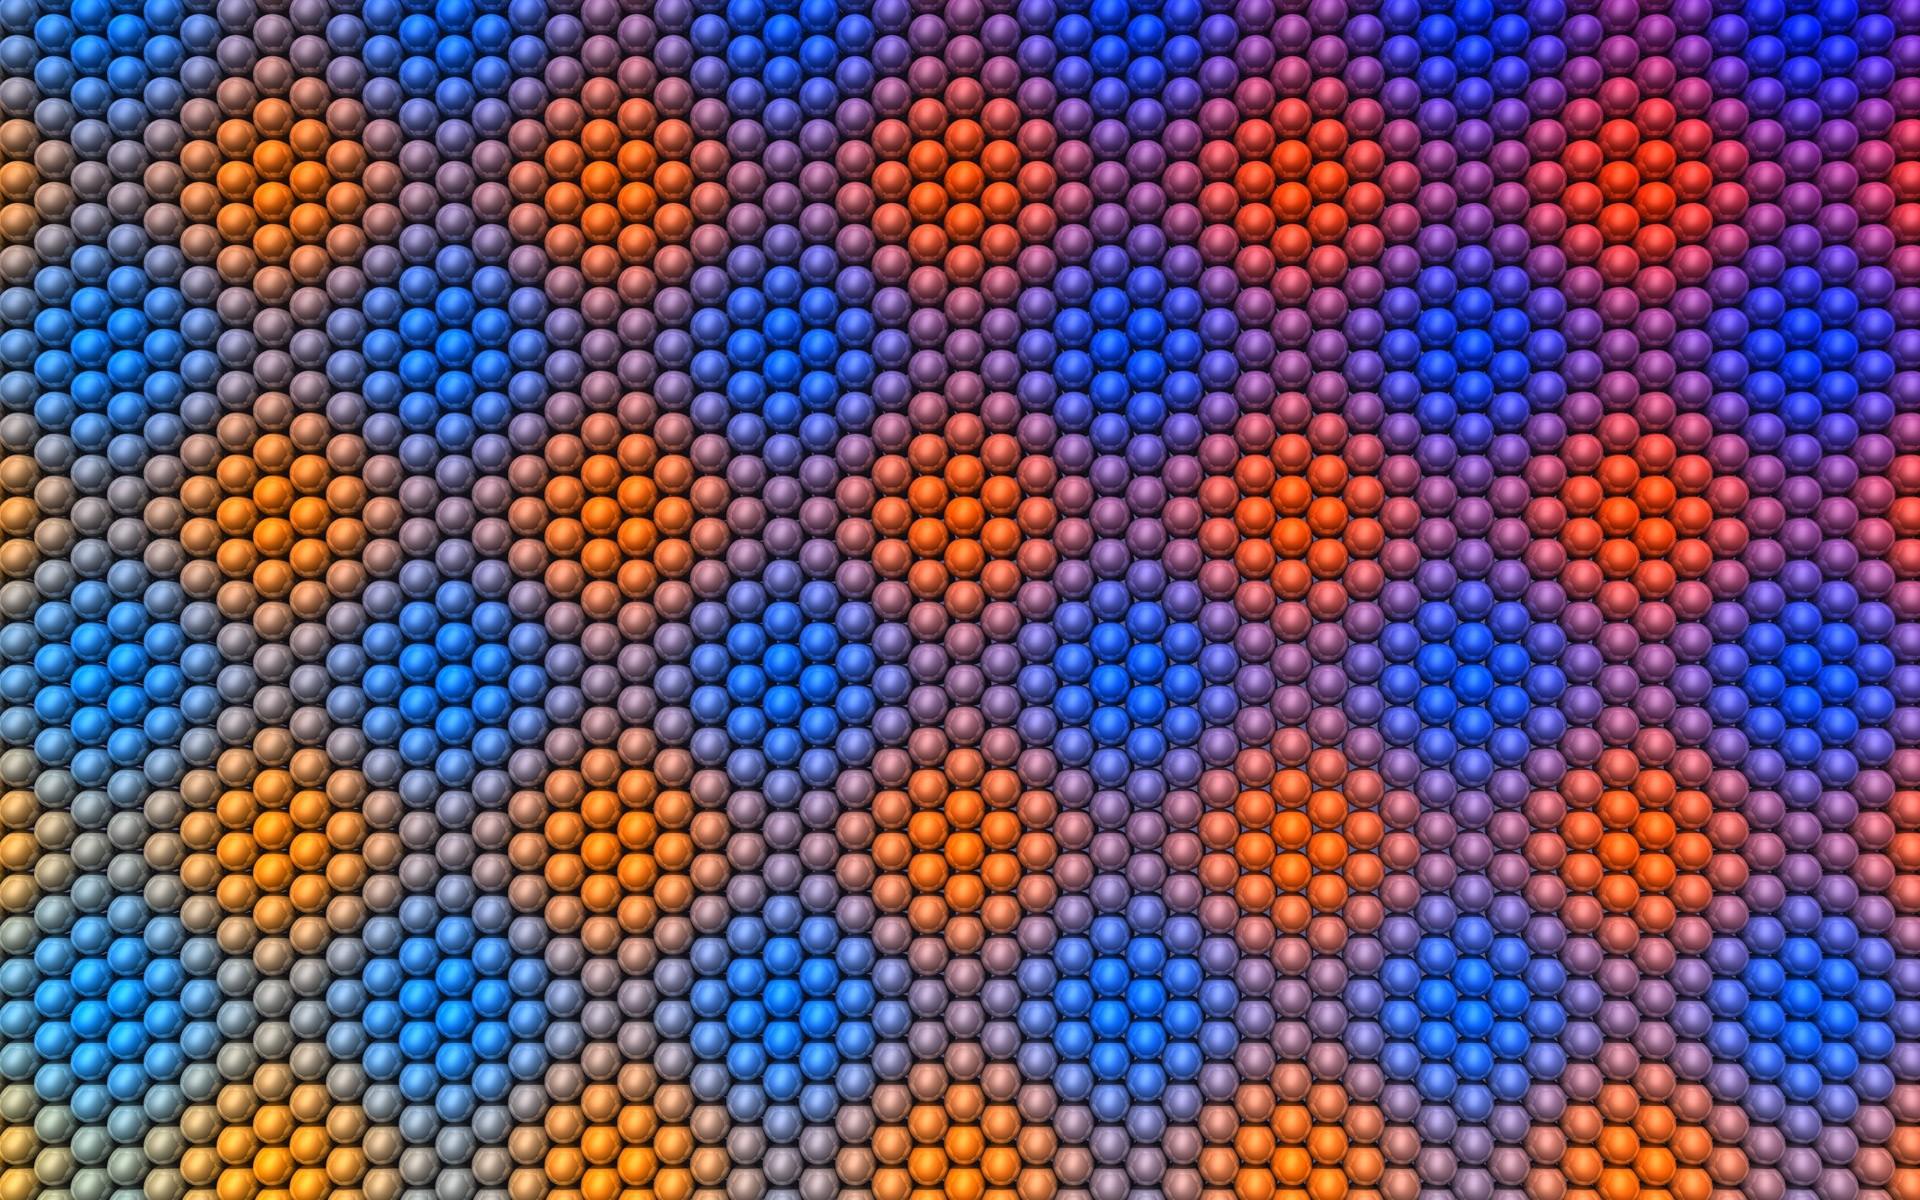 blue-orange-hd-color-wallpaper